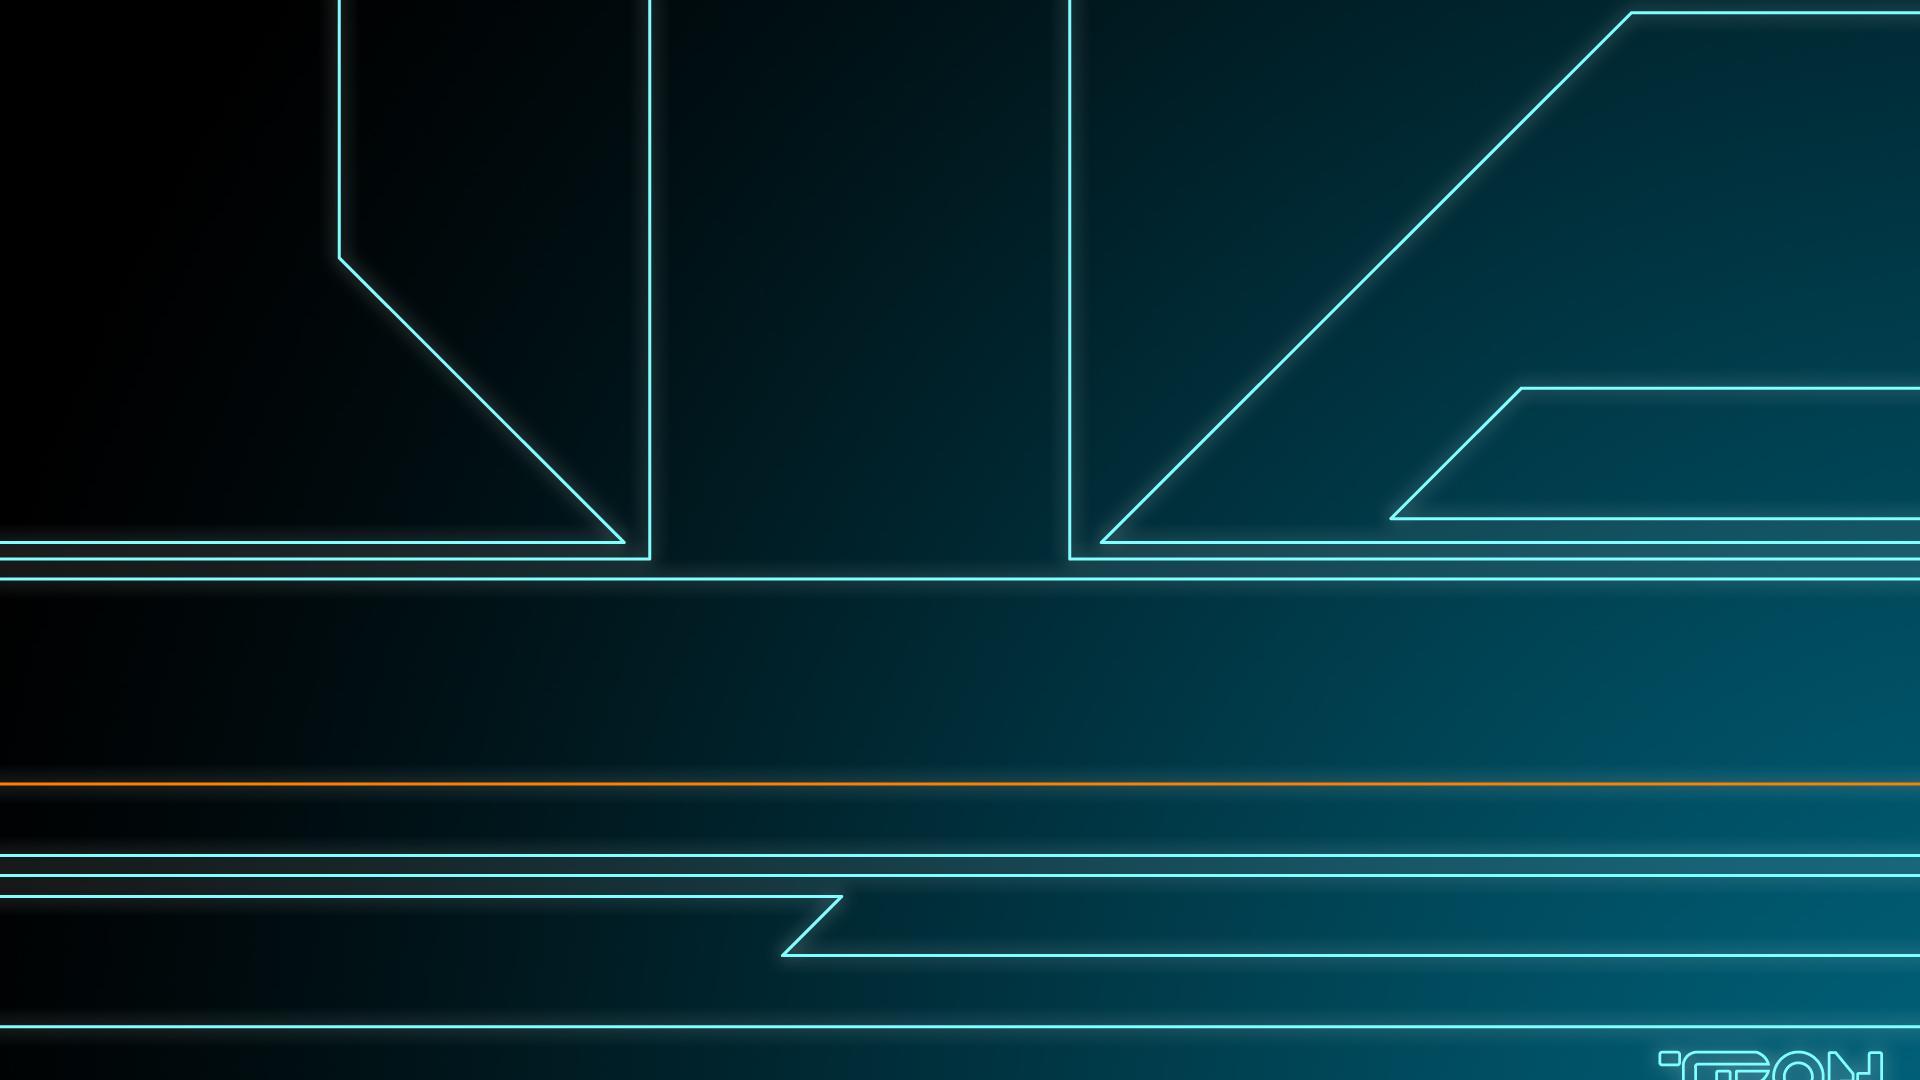 Breaking Bad Wallpaper Quotes Tron Legacy Hd Wallpapers Pixelstalk Net